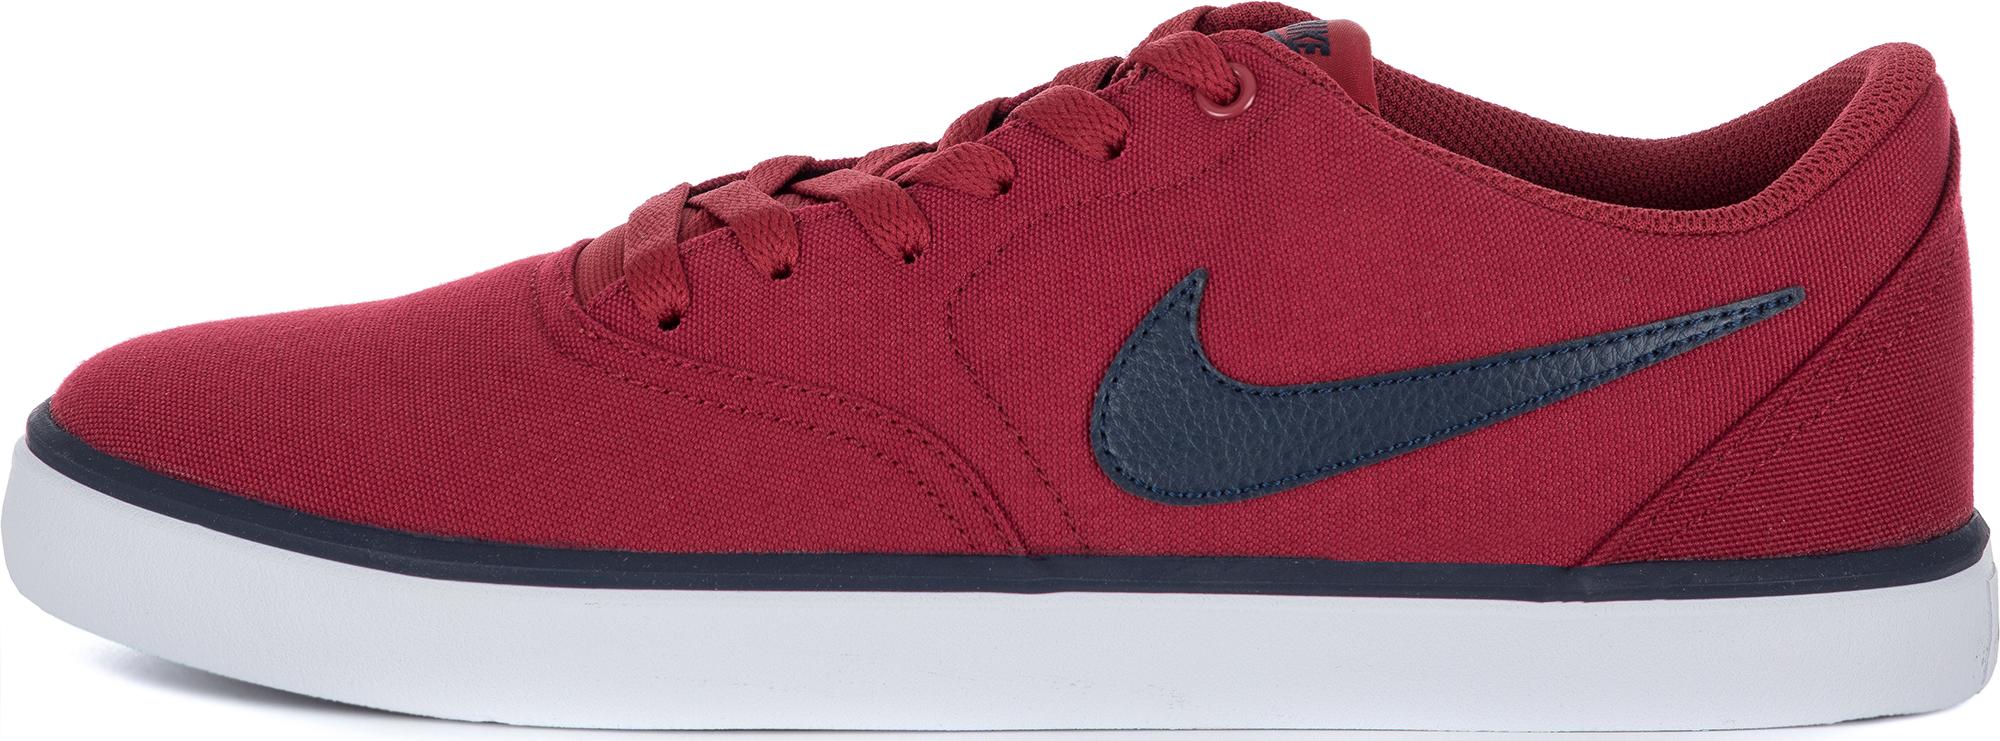 Nike Кеды мужские Sb Check Solar Cnvs, размер 45